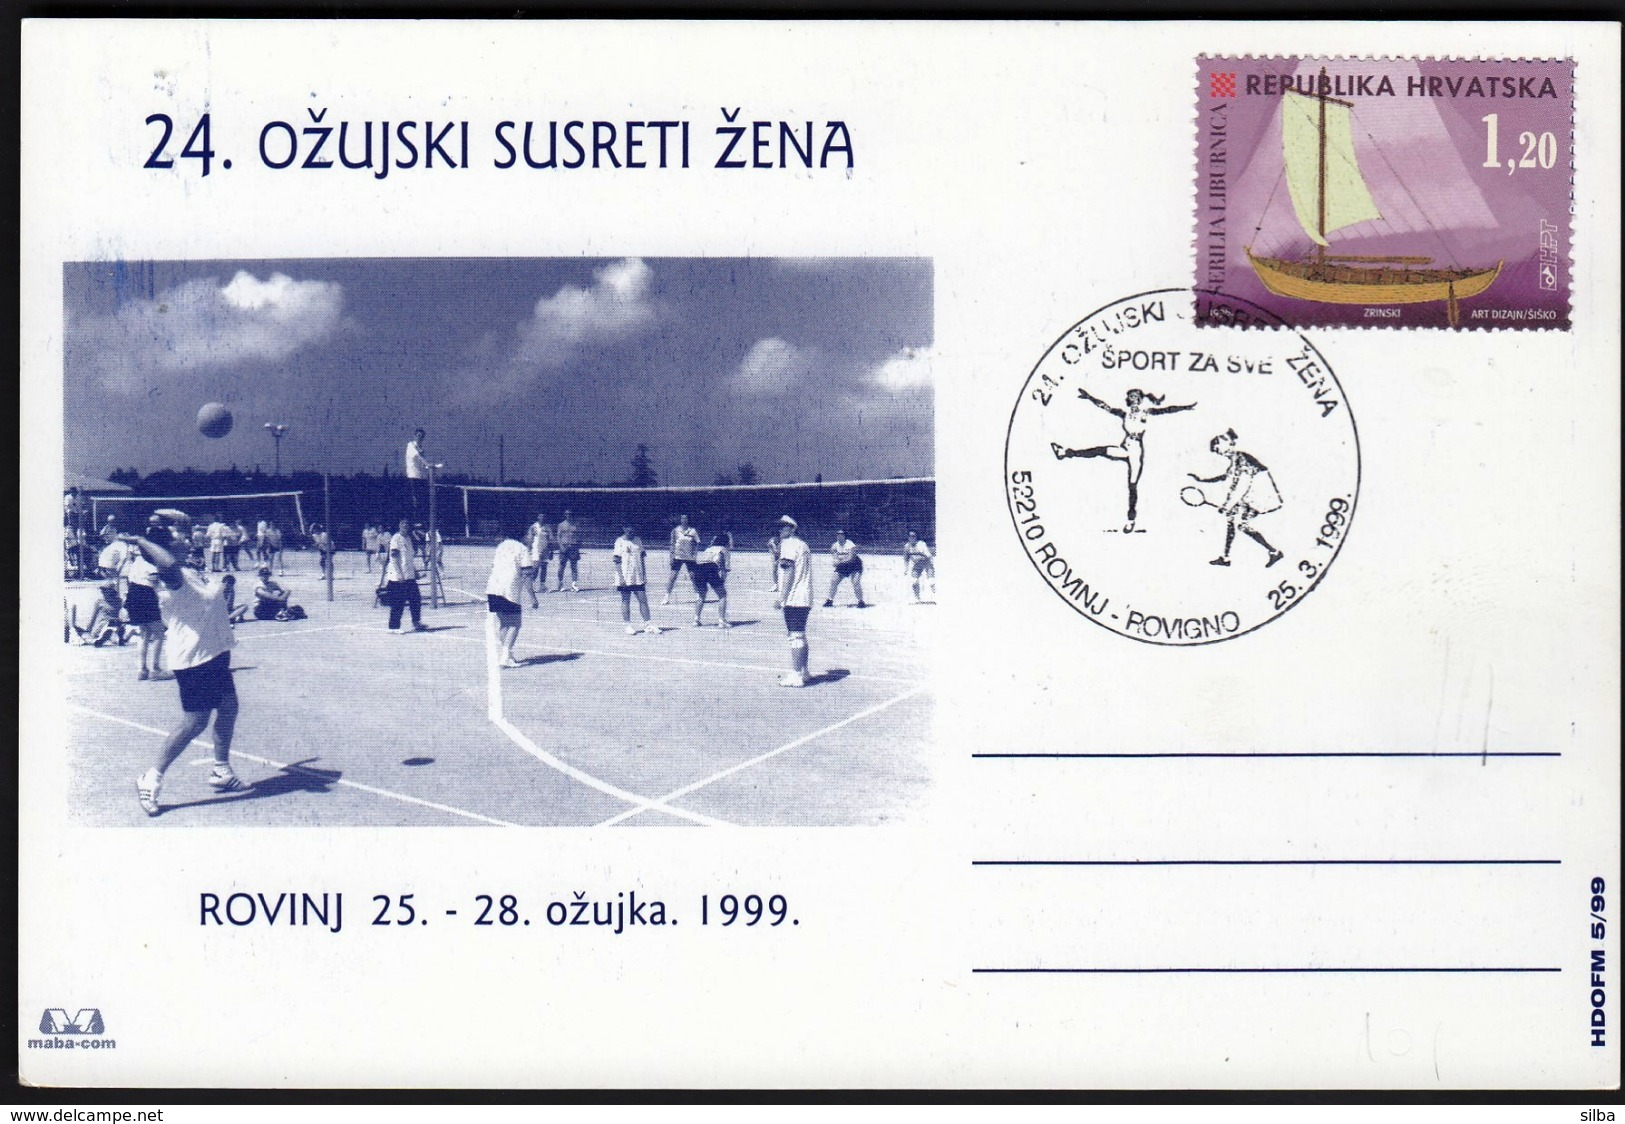 Croatia Rovinj - Rovigno 1999 / 24th March Women Sport Meetings / Tennis, Recreation, Volleyball / Sport For All - Tenis